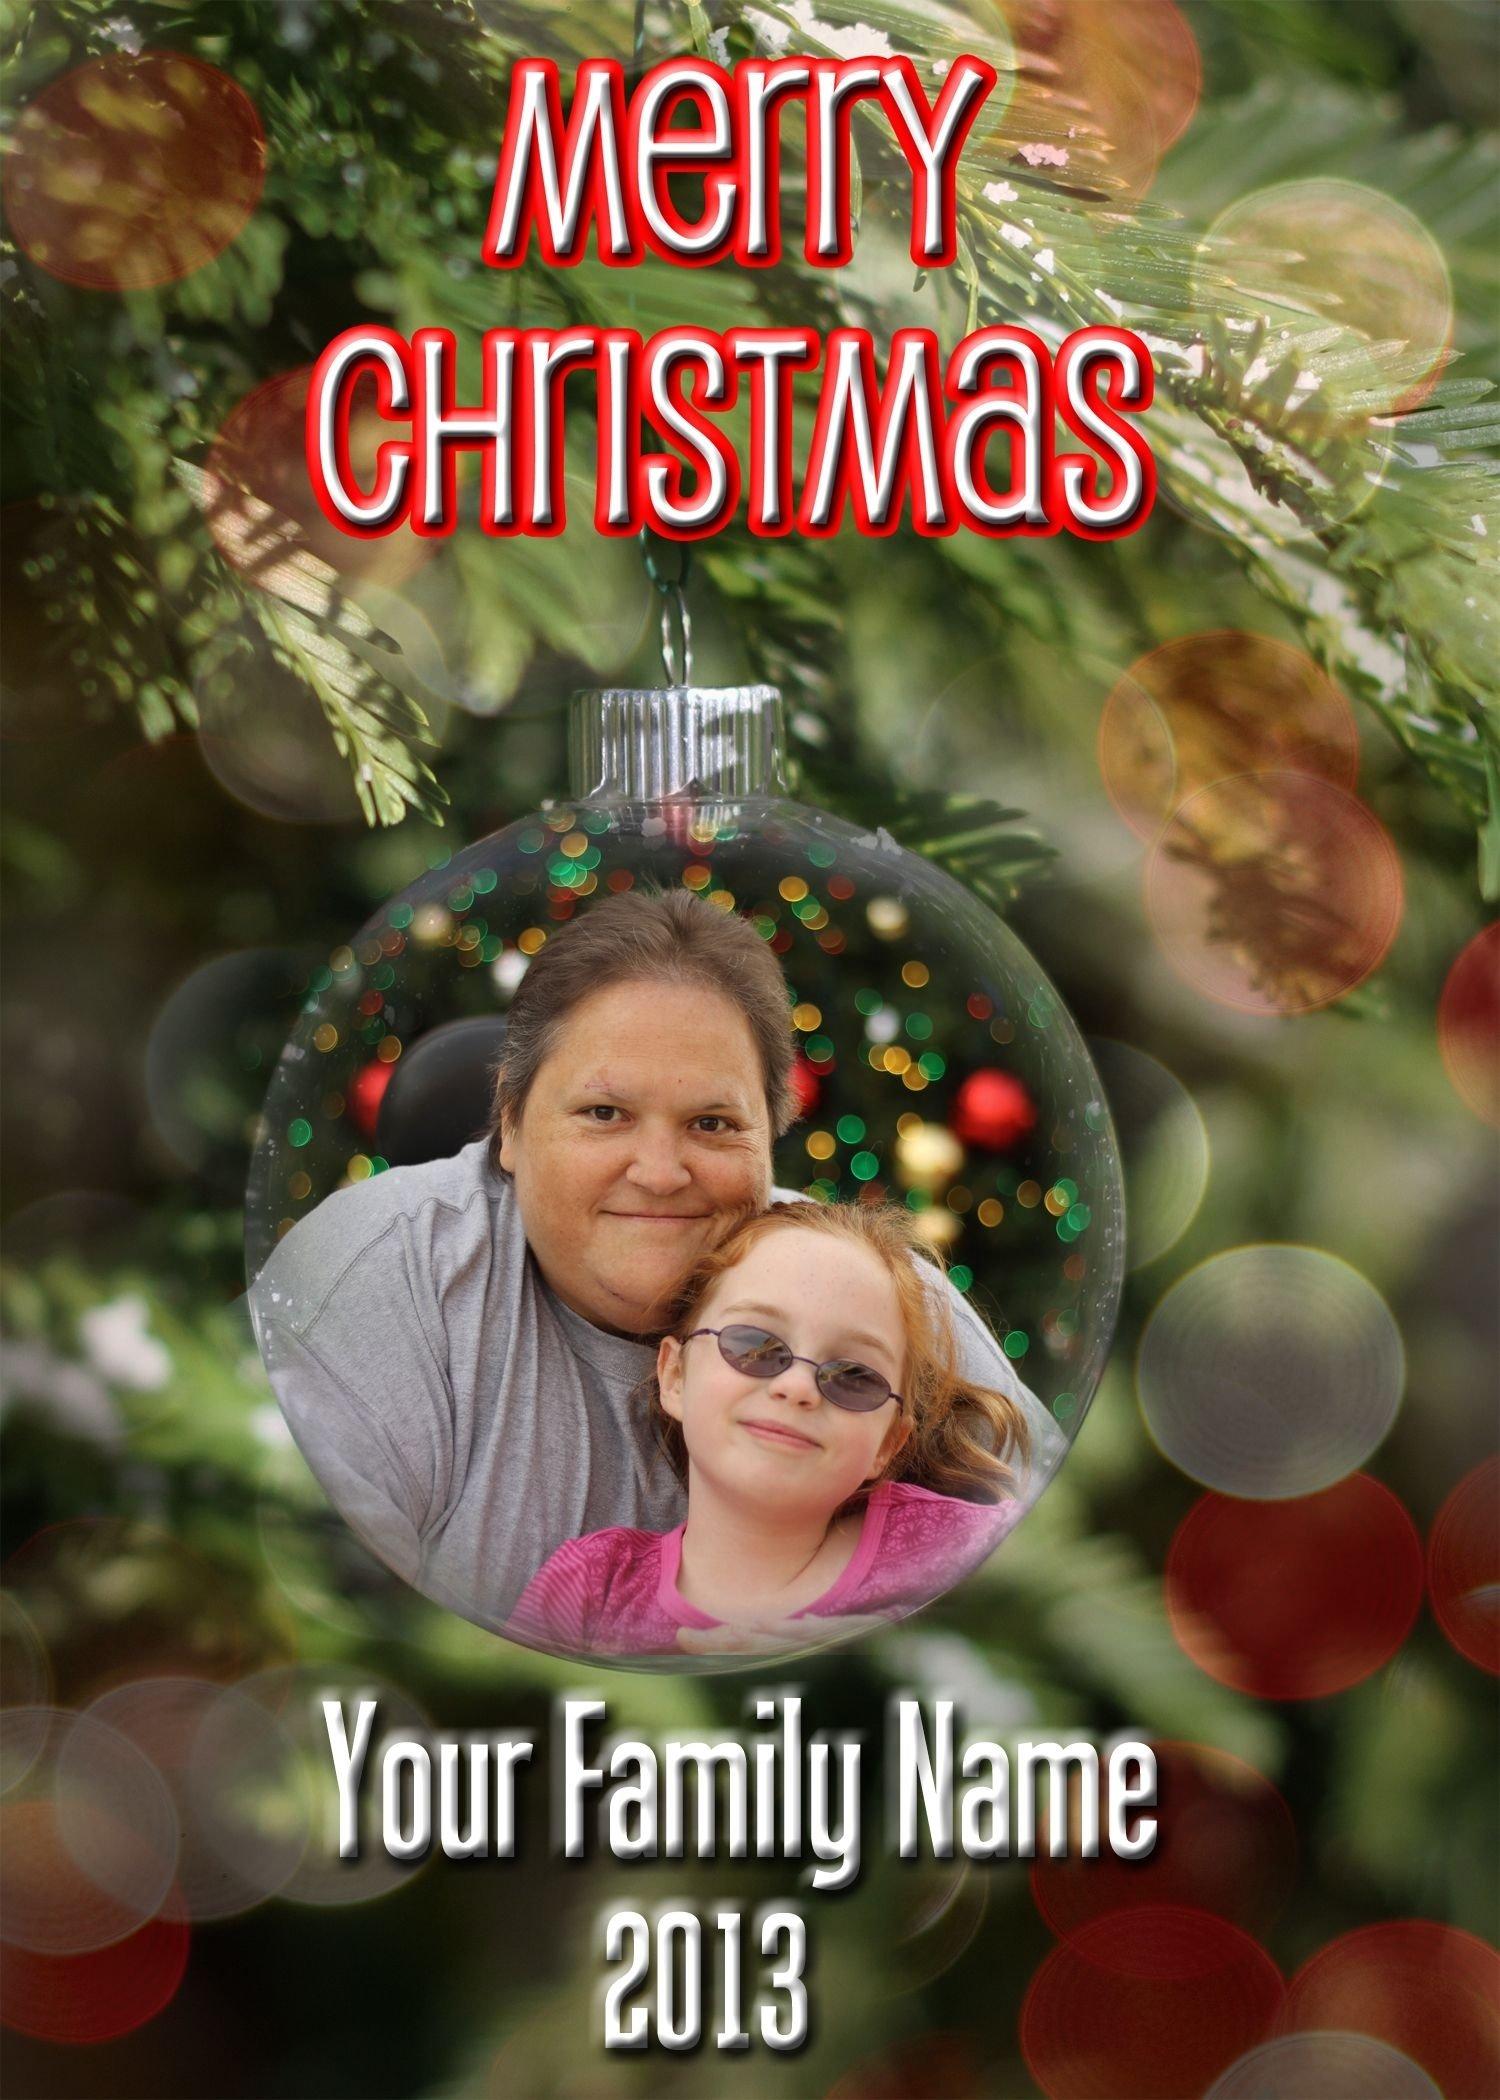 10 Fashionable Creative Christmas Card Photo Ideas lisadh i will create a christmas card with your photo in an 2021